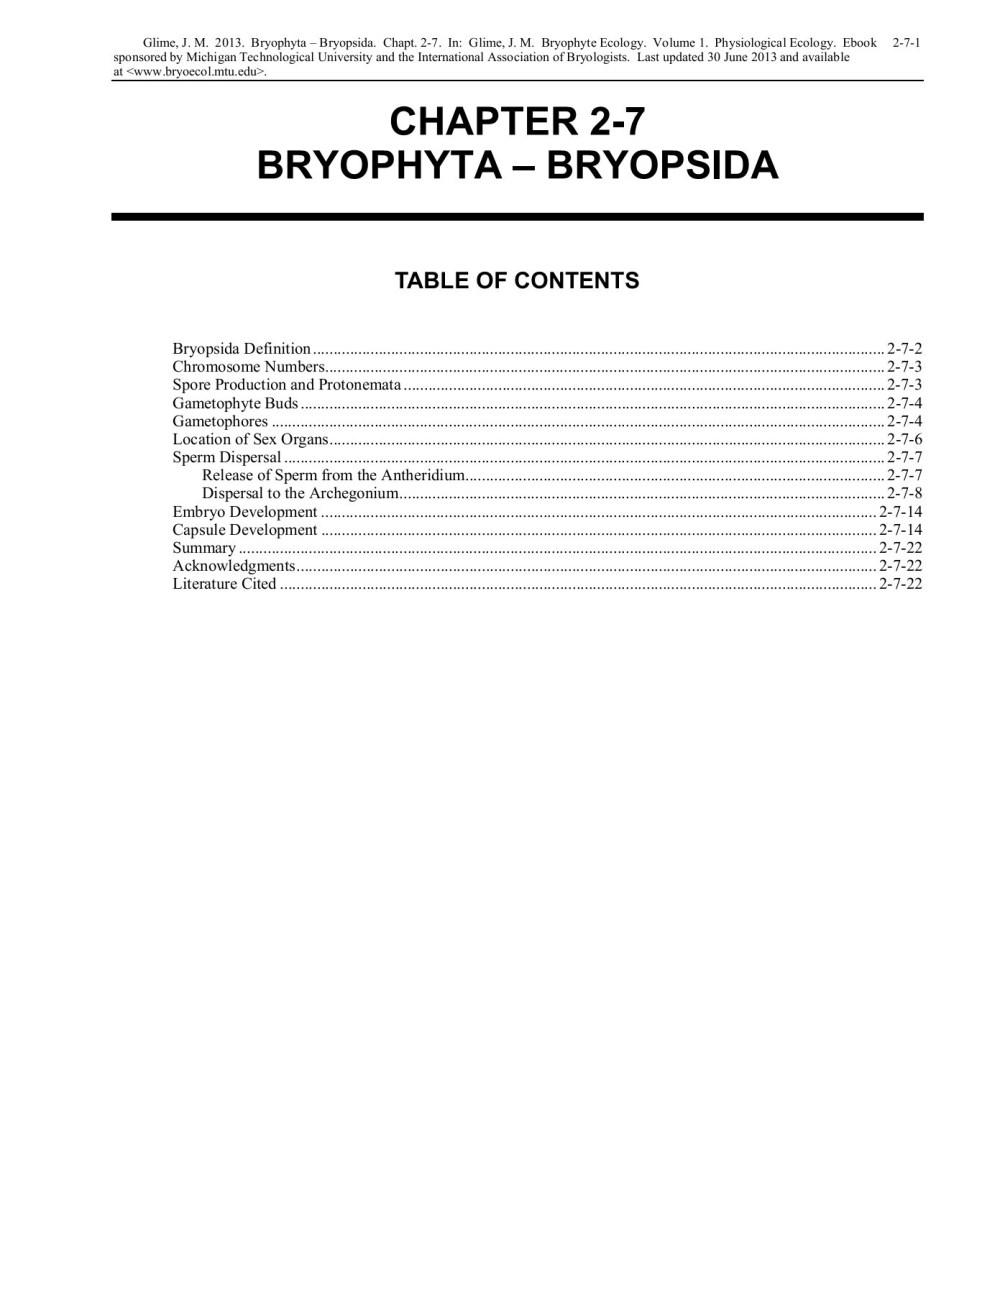 medium resolution of at www bryoecol mtu edu chapter 2 7 bryophyta bryopsida pages 1 24 text version fliphtml5